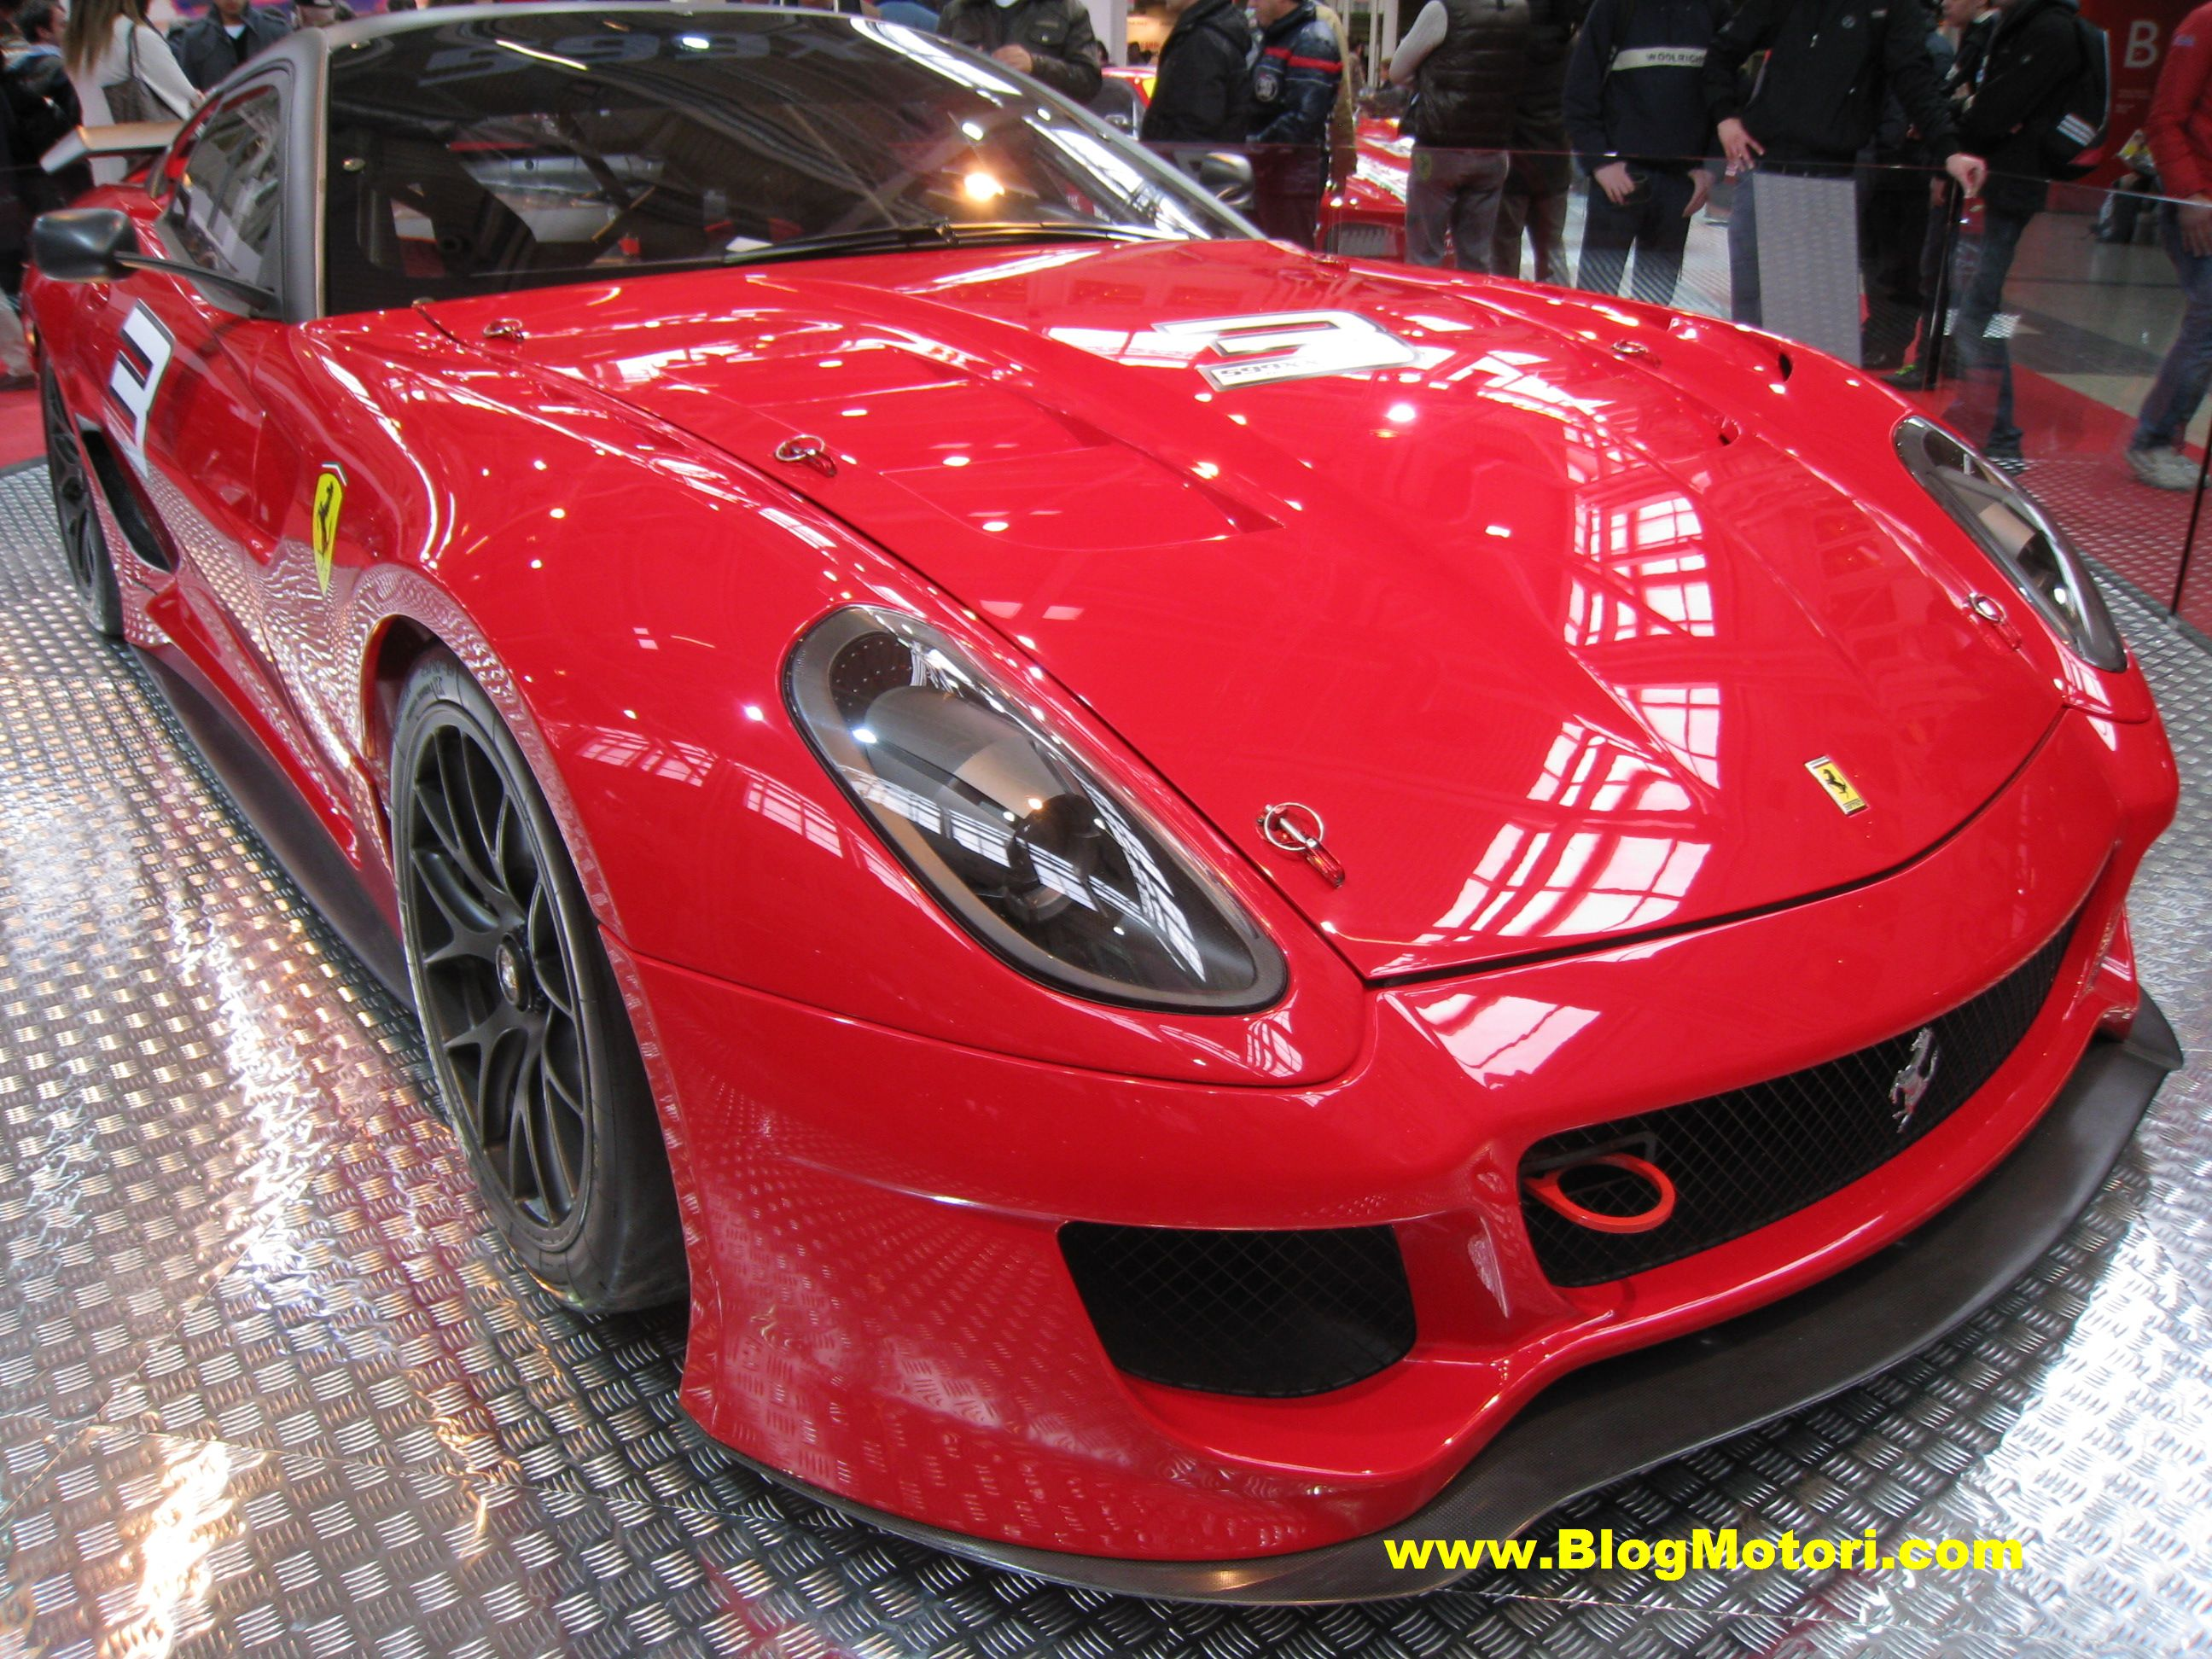 Motor Show 2010: a Bologna dal 4 al 12 dicembre